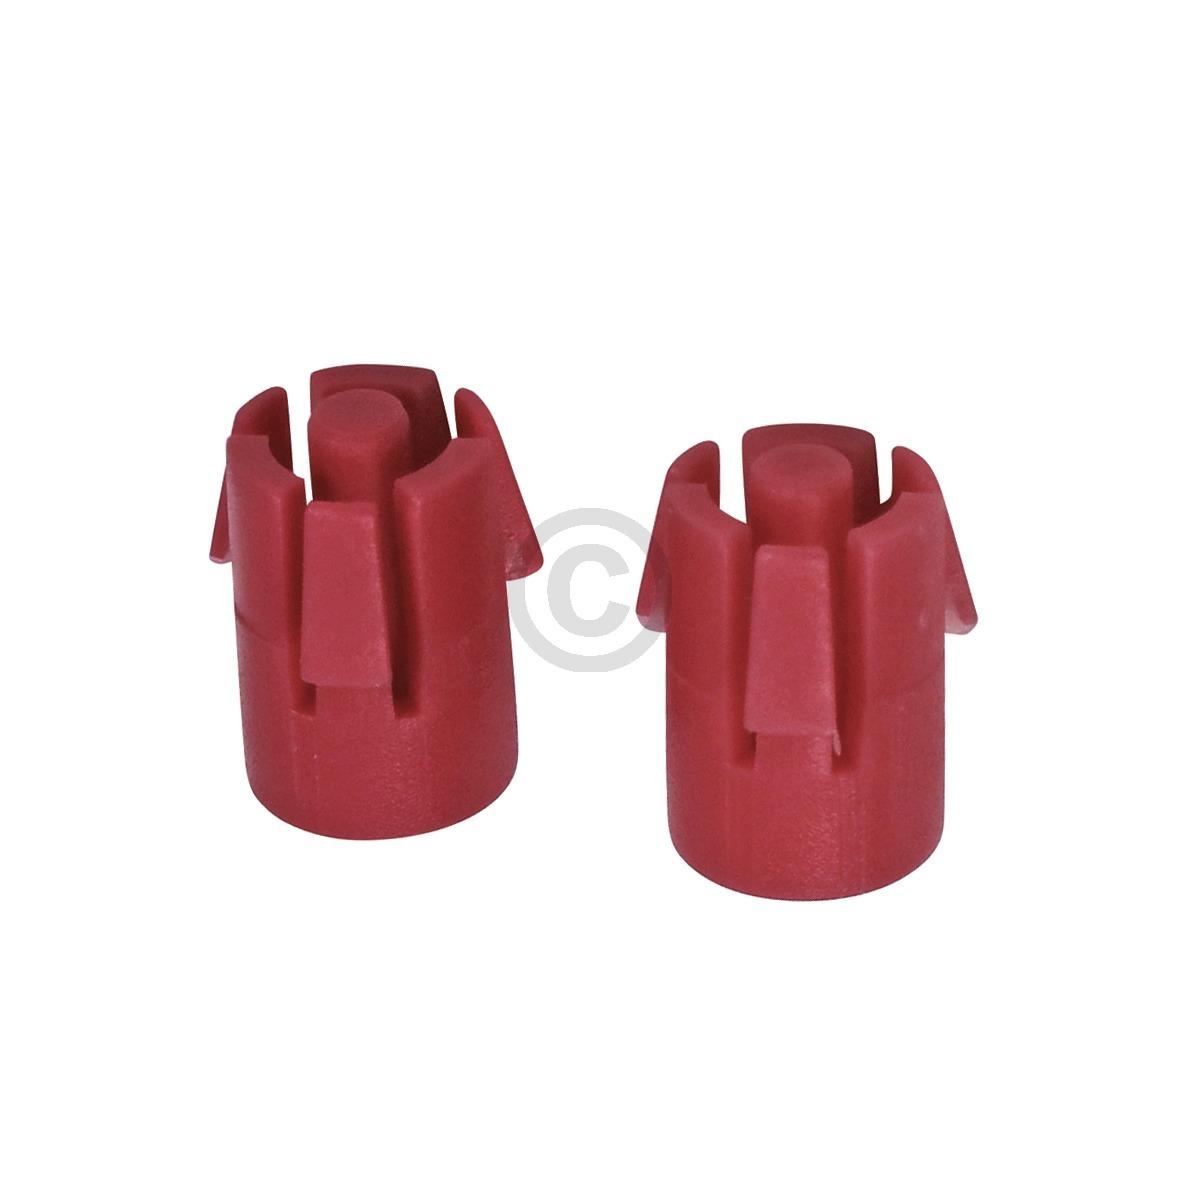 Fettfilter-Taste rot, 2 Stück 00069397 069397 Bosch, Siemens, Neff